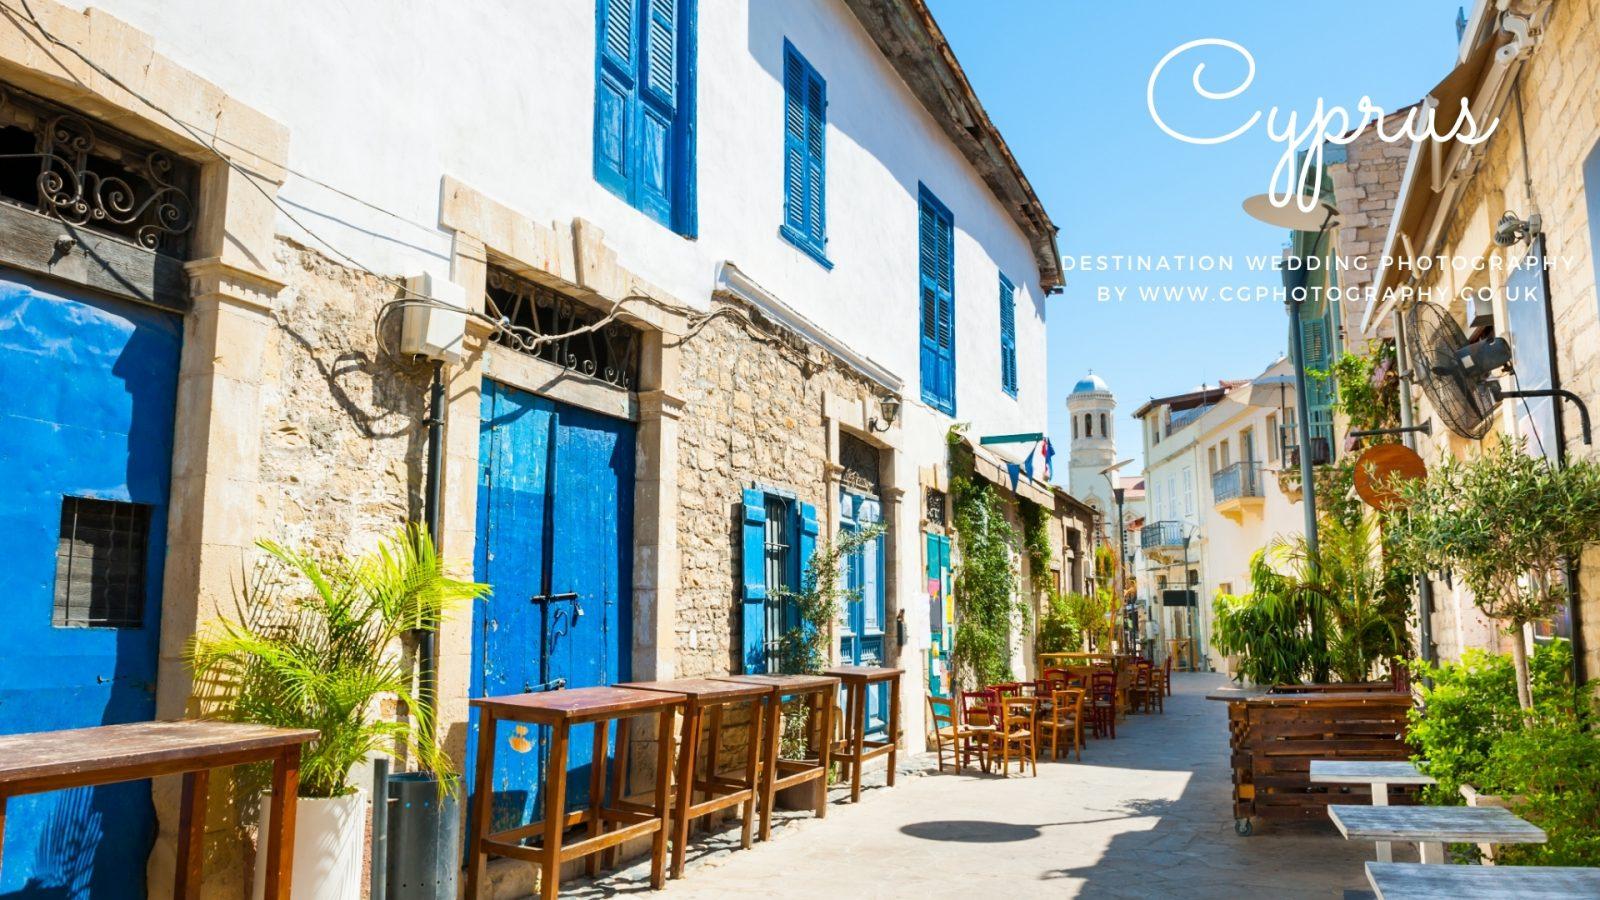 Weddings Abroad in Cyrpus